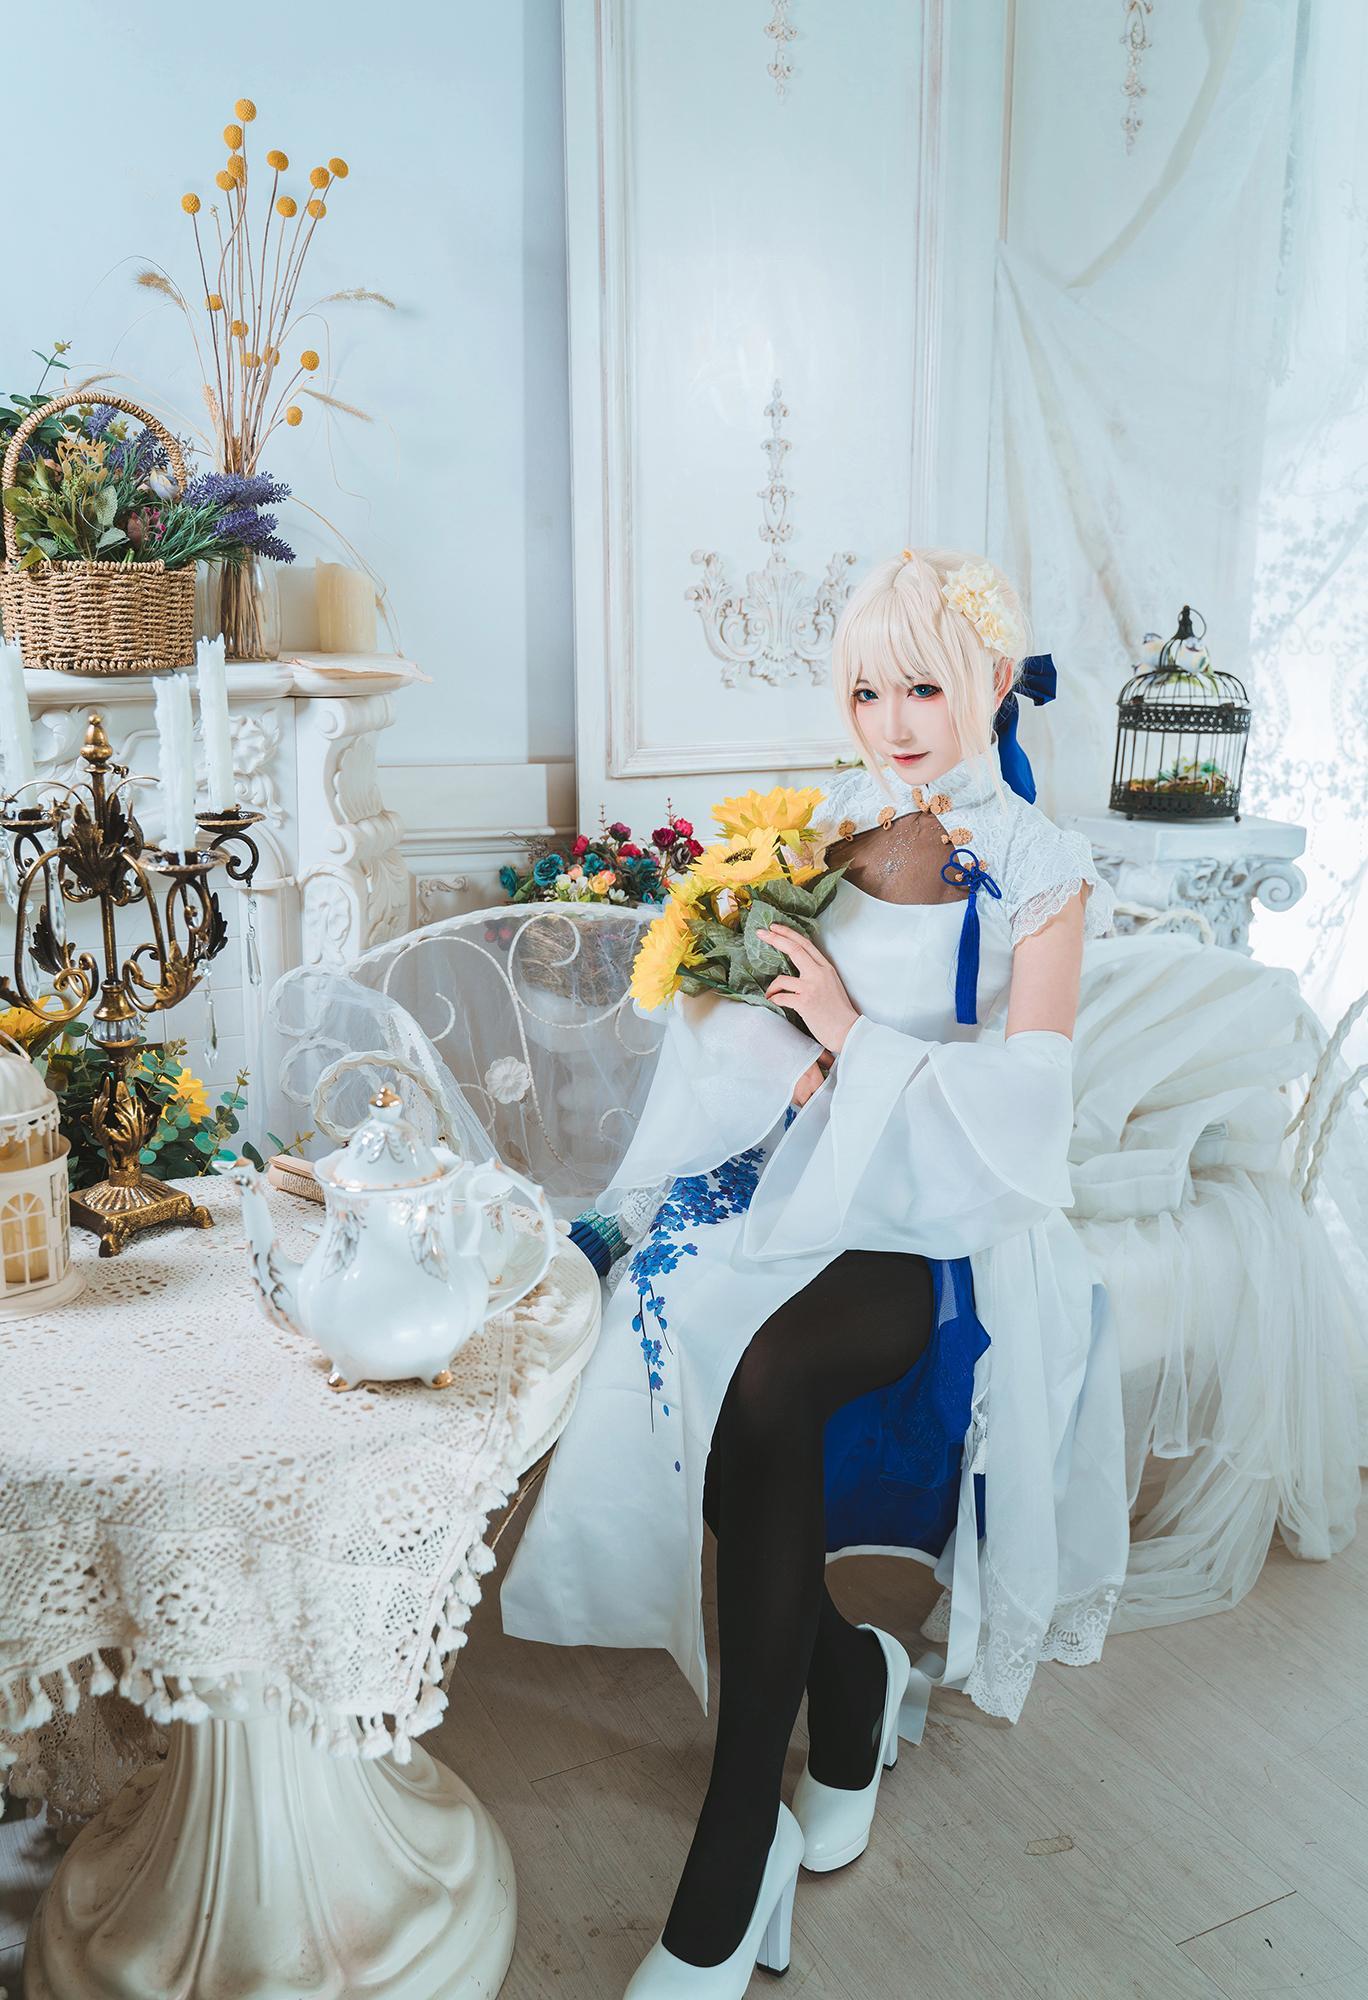 《FATE/GRAND ORDER》旗袍cosplay【CN:许多鱼鱼鱼】-第6张